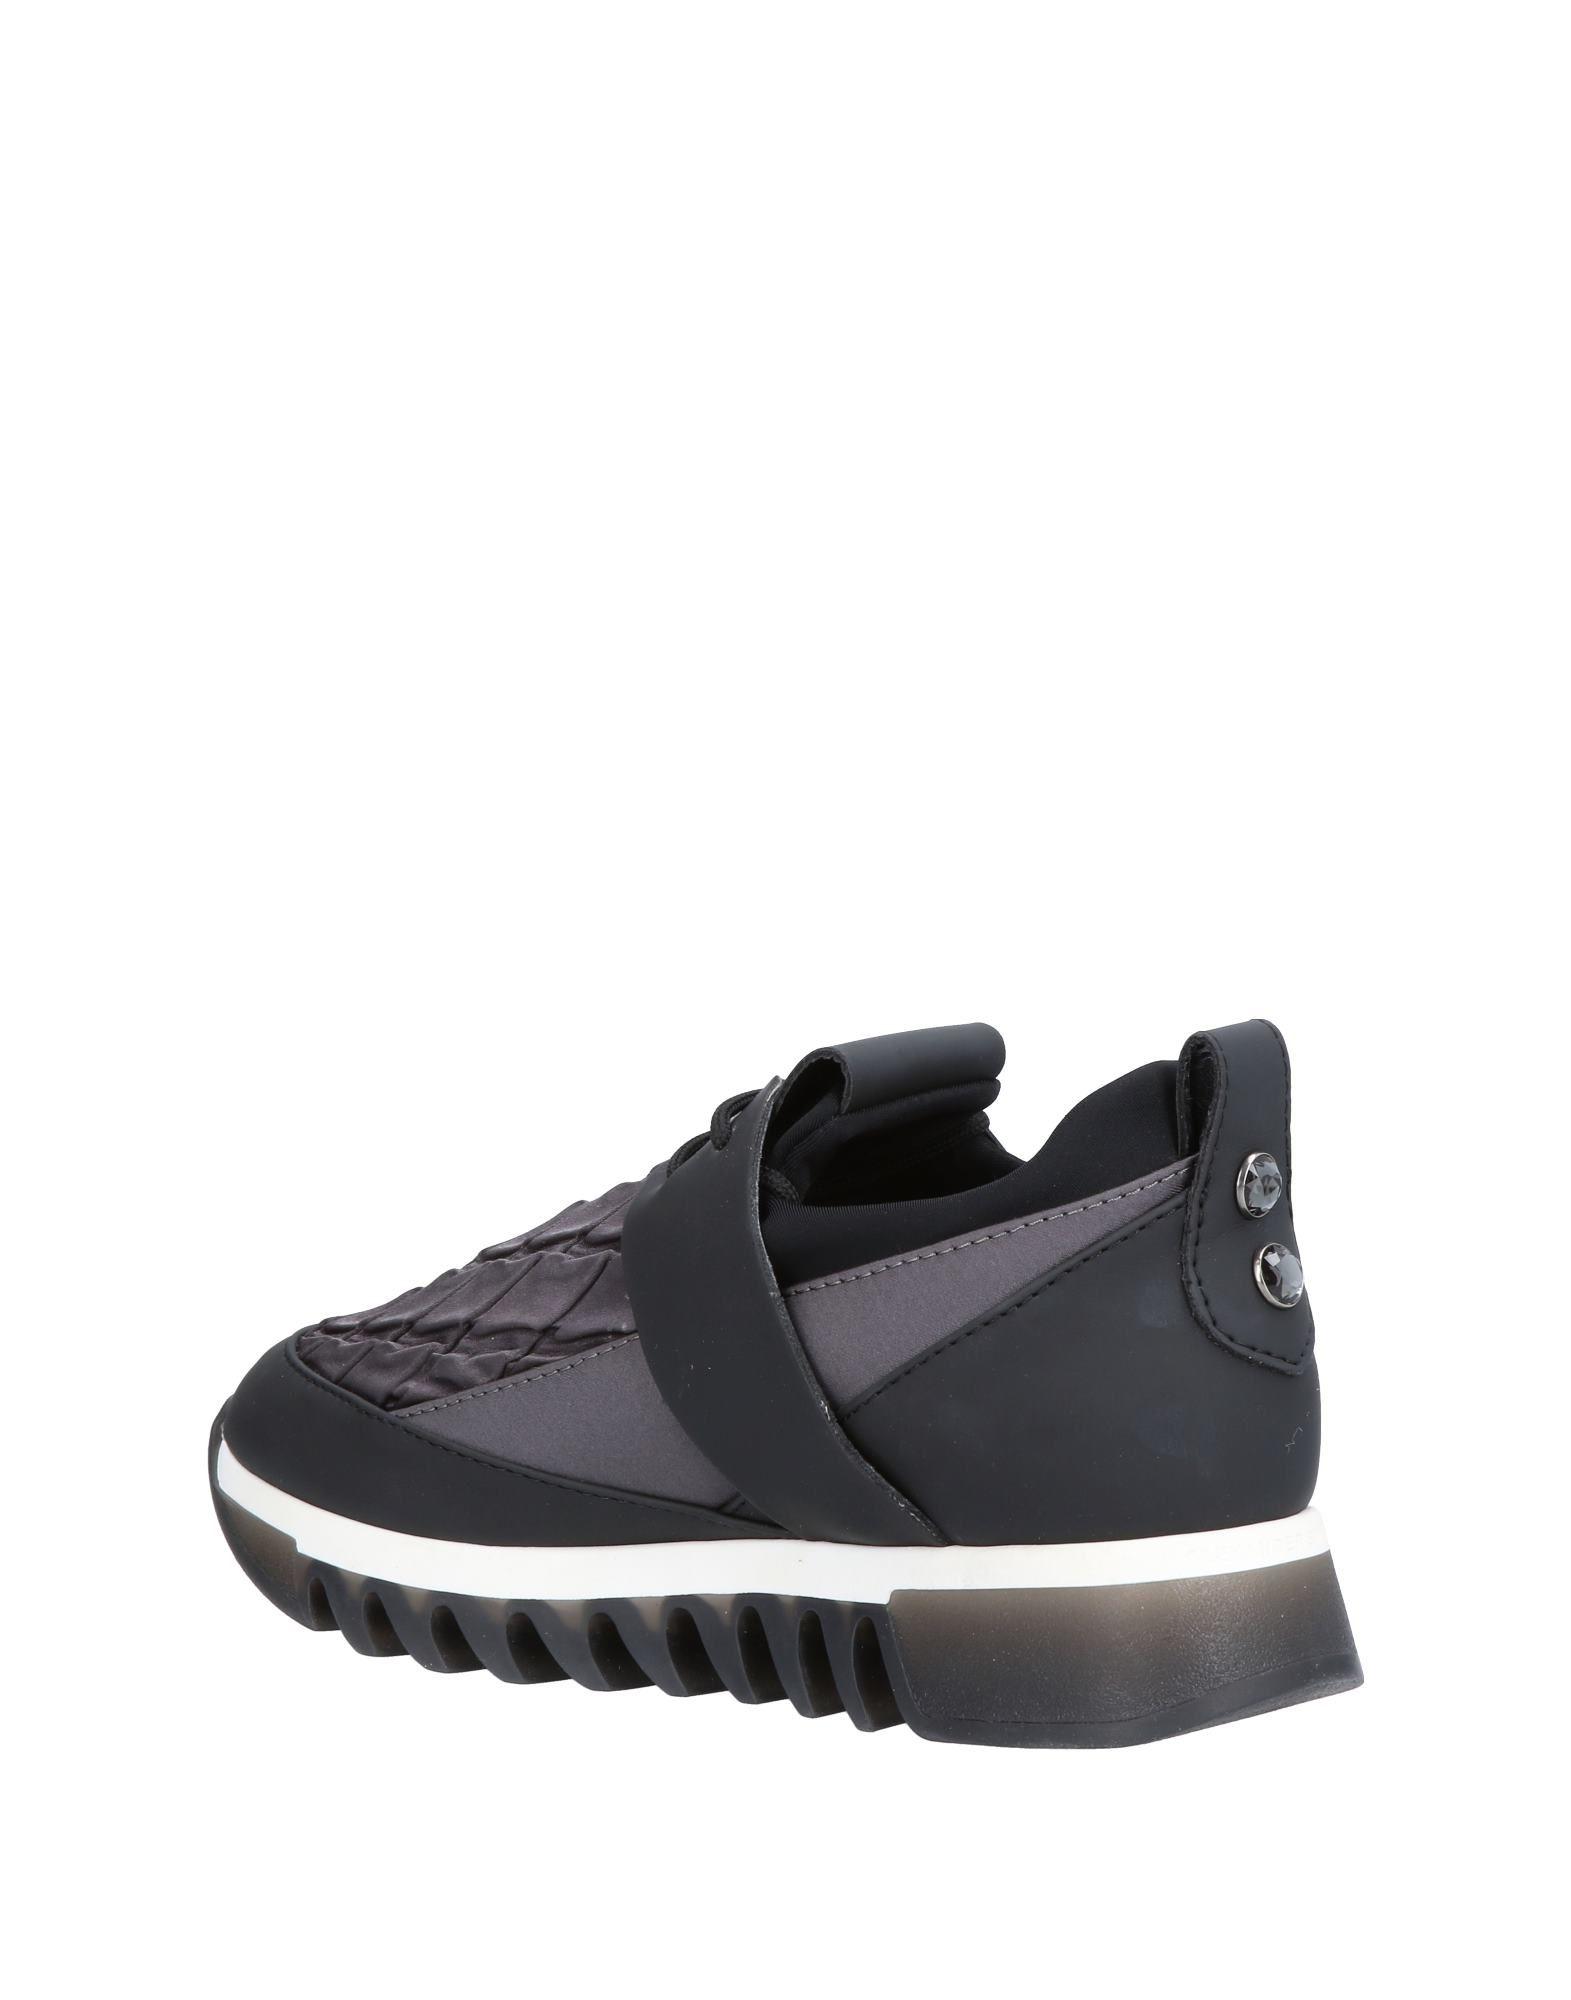 Alexander Smith Sneakers Sneakers Sneakers Damen  11484352XJ Neue Schuhe 3ac818